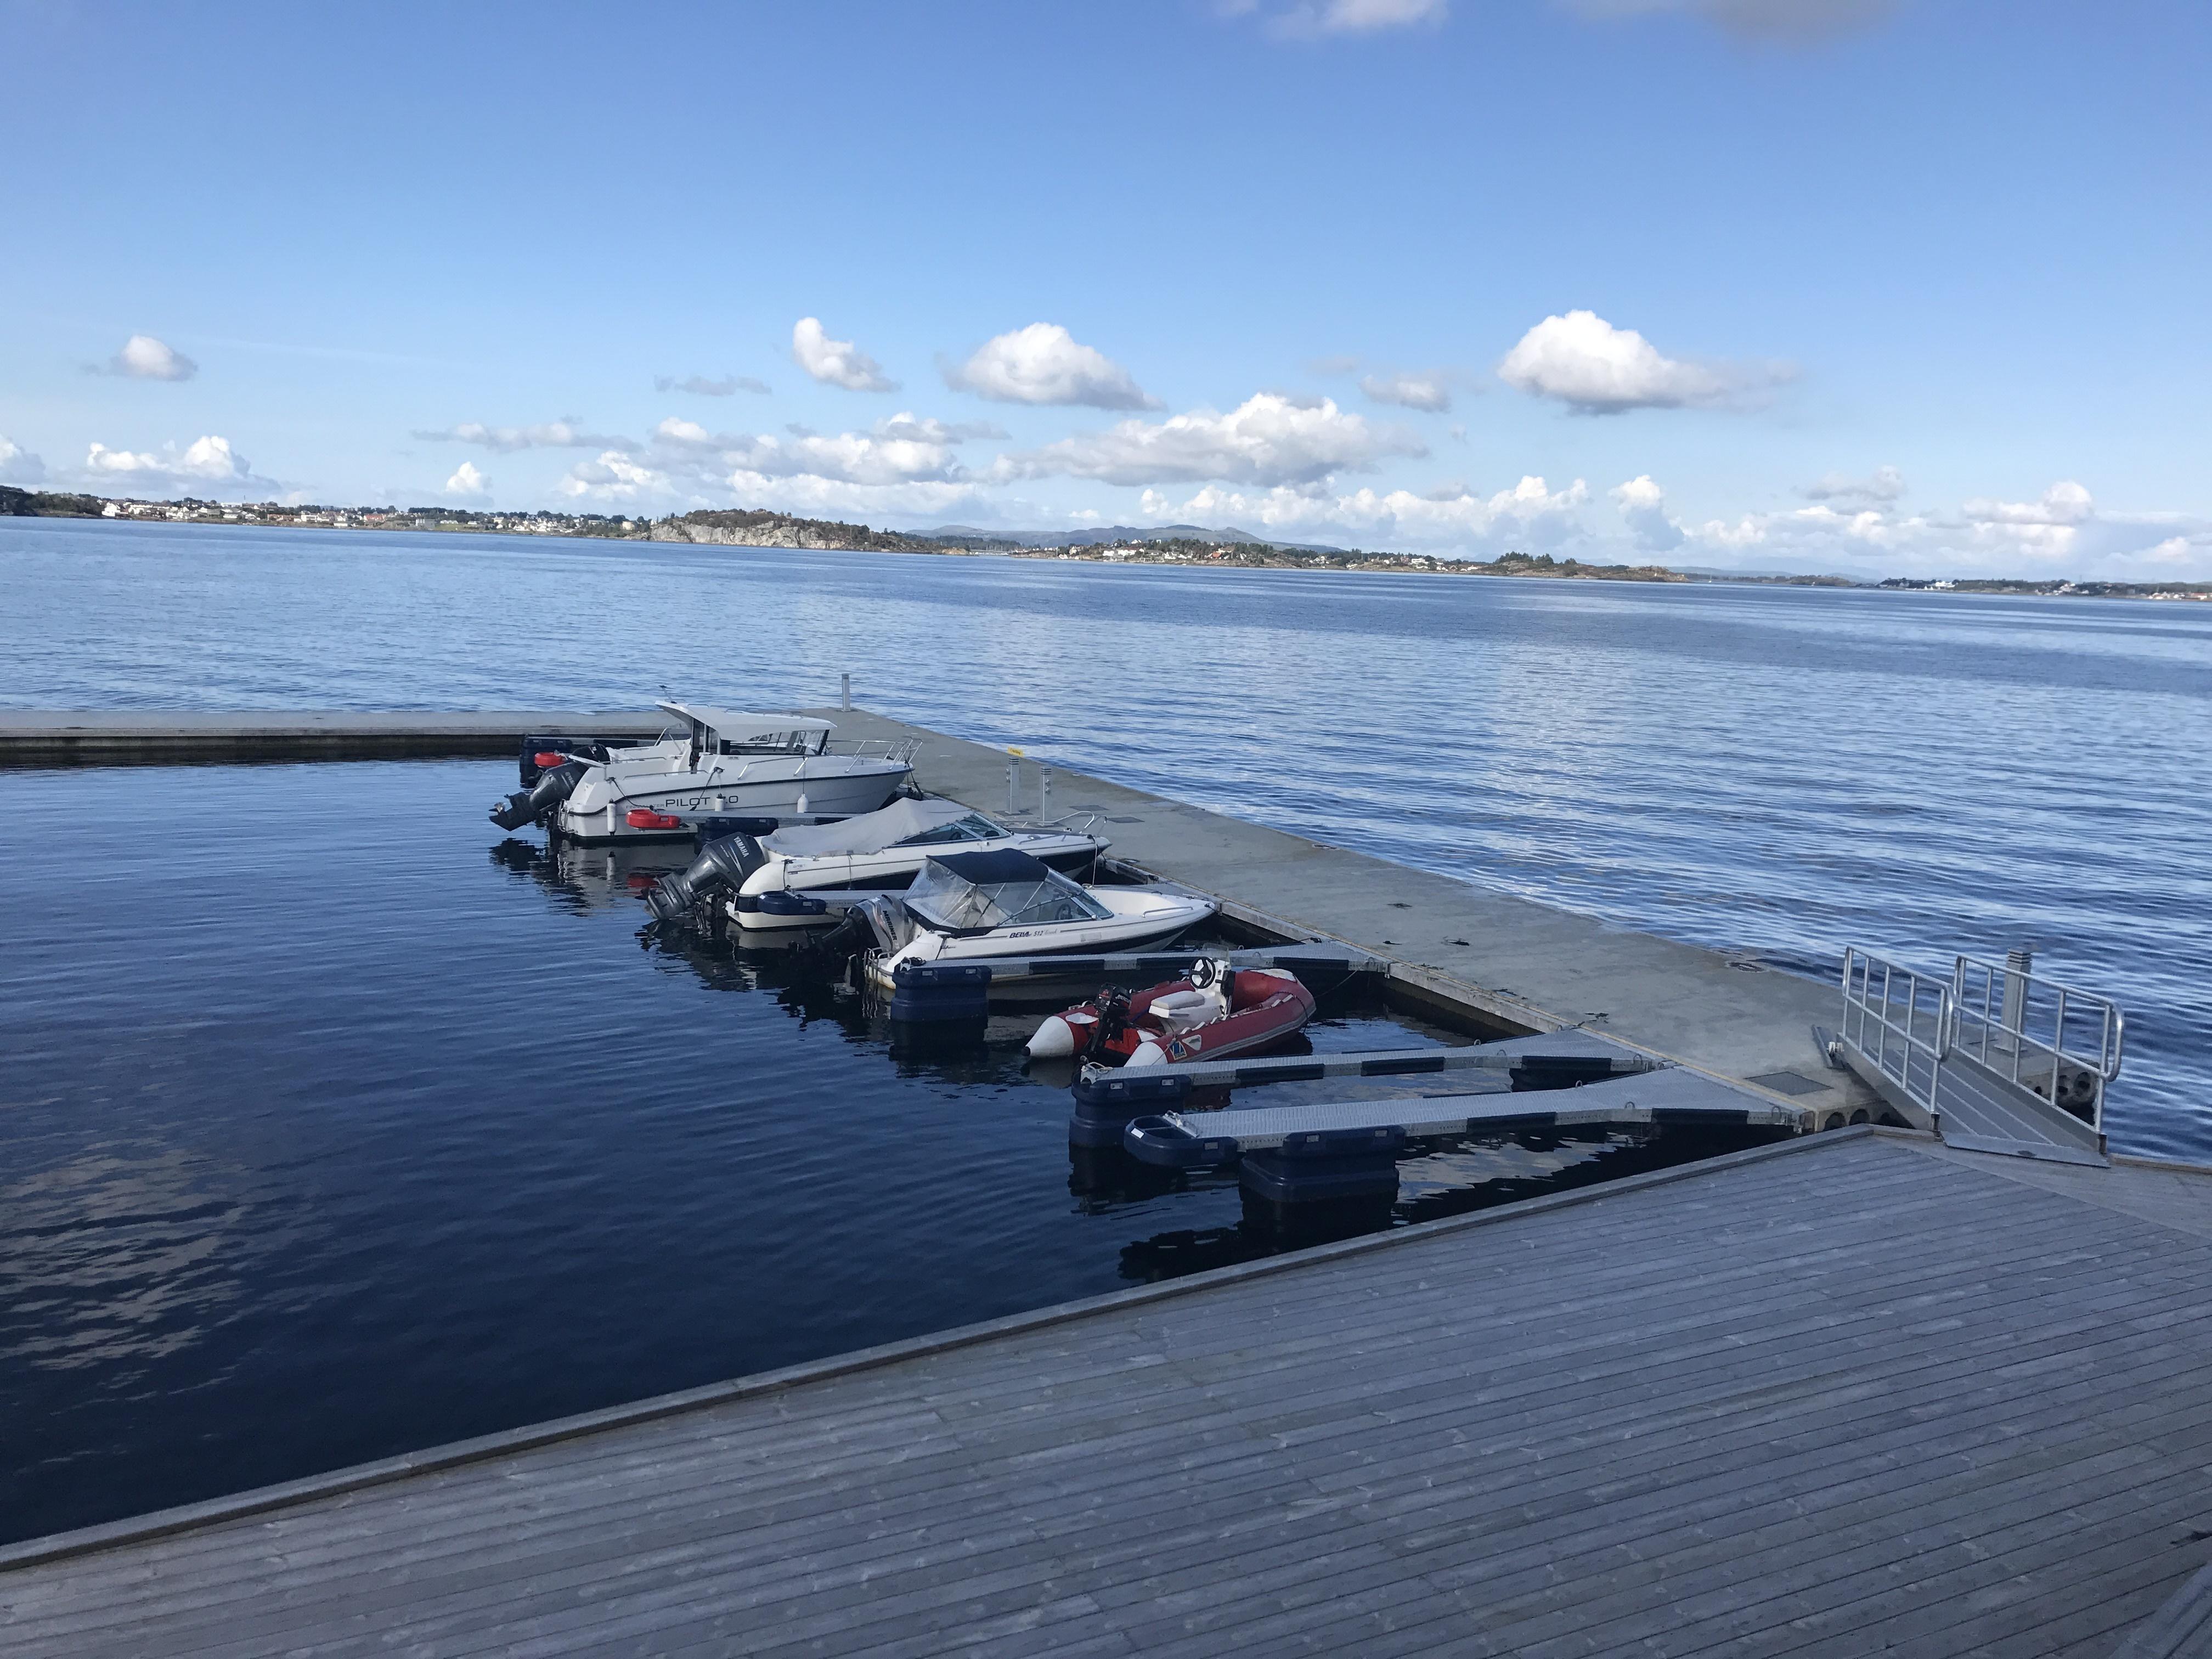 https://marinasolutions.no/uploads/Lervig-Brygge-Stavanger-Øst-2.JPG